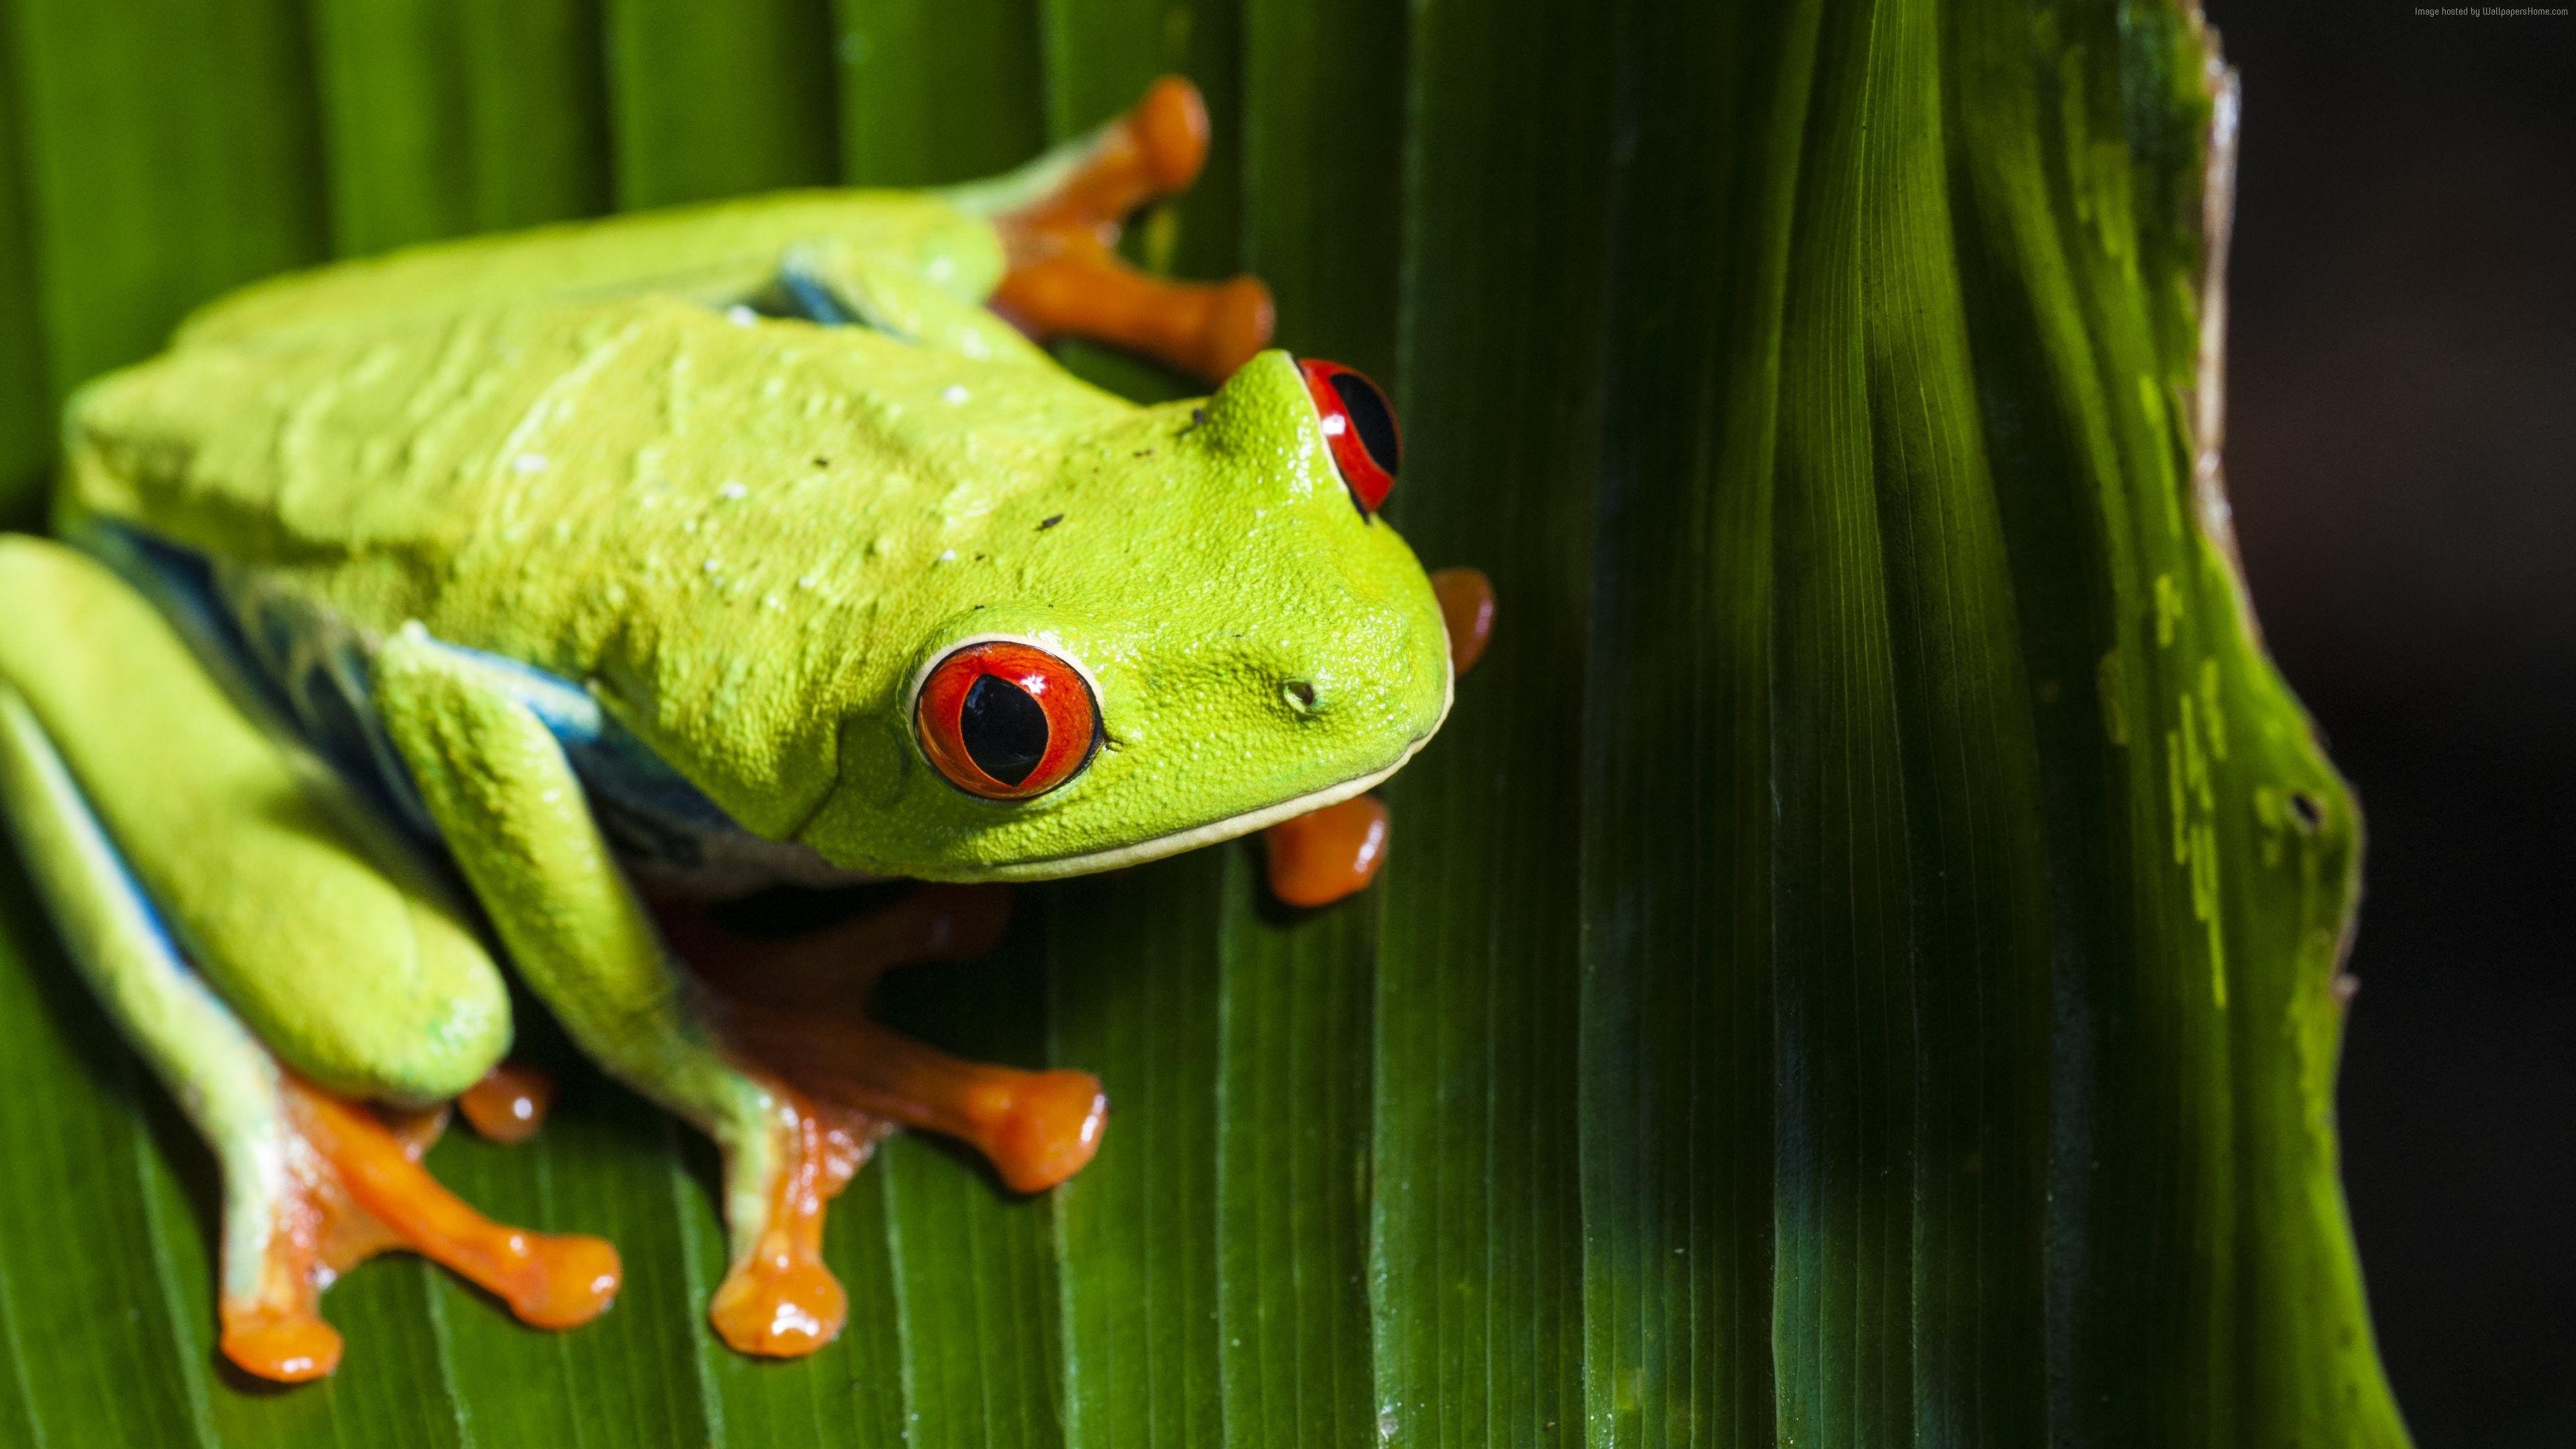 Wallpaper Frog Green 4k Animals Https Www Pxwall Com Wallpaper Frog Green 4k Animals Animal Wallpaper Red Eyed Tree Frog Animals